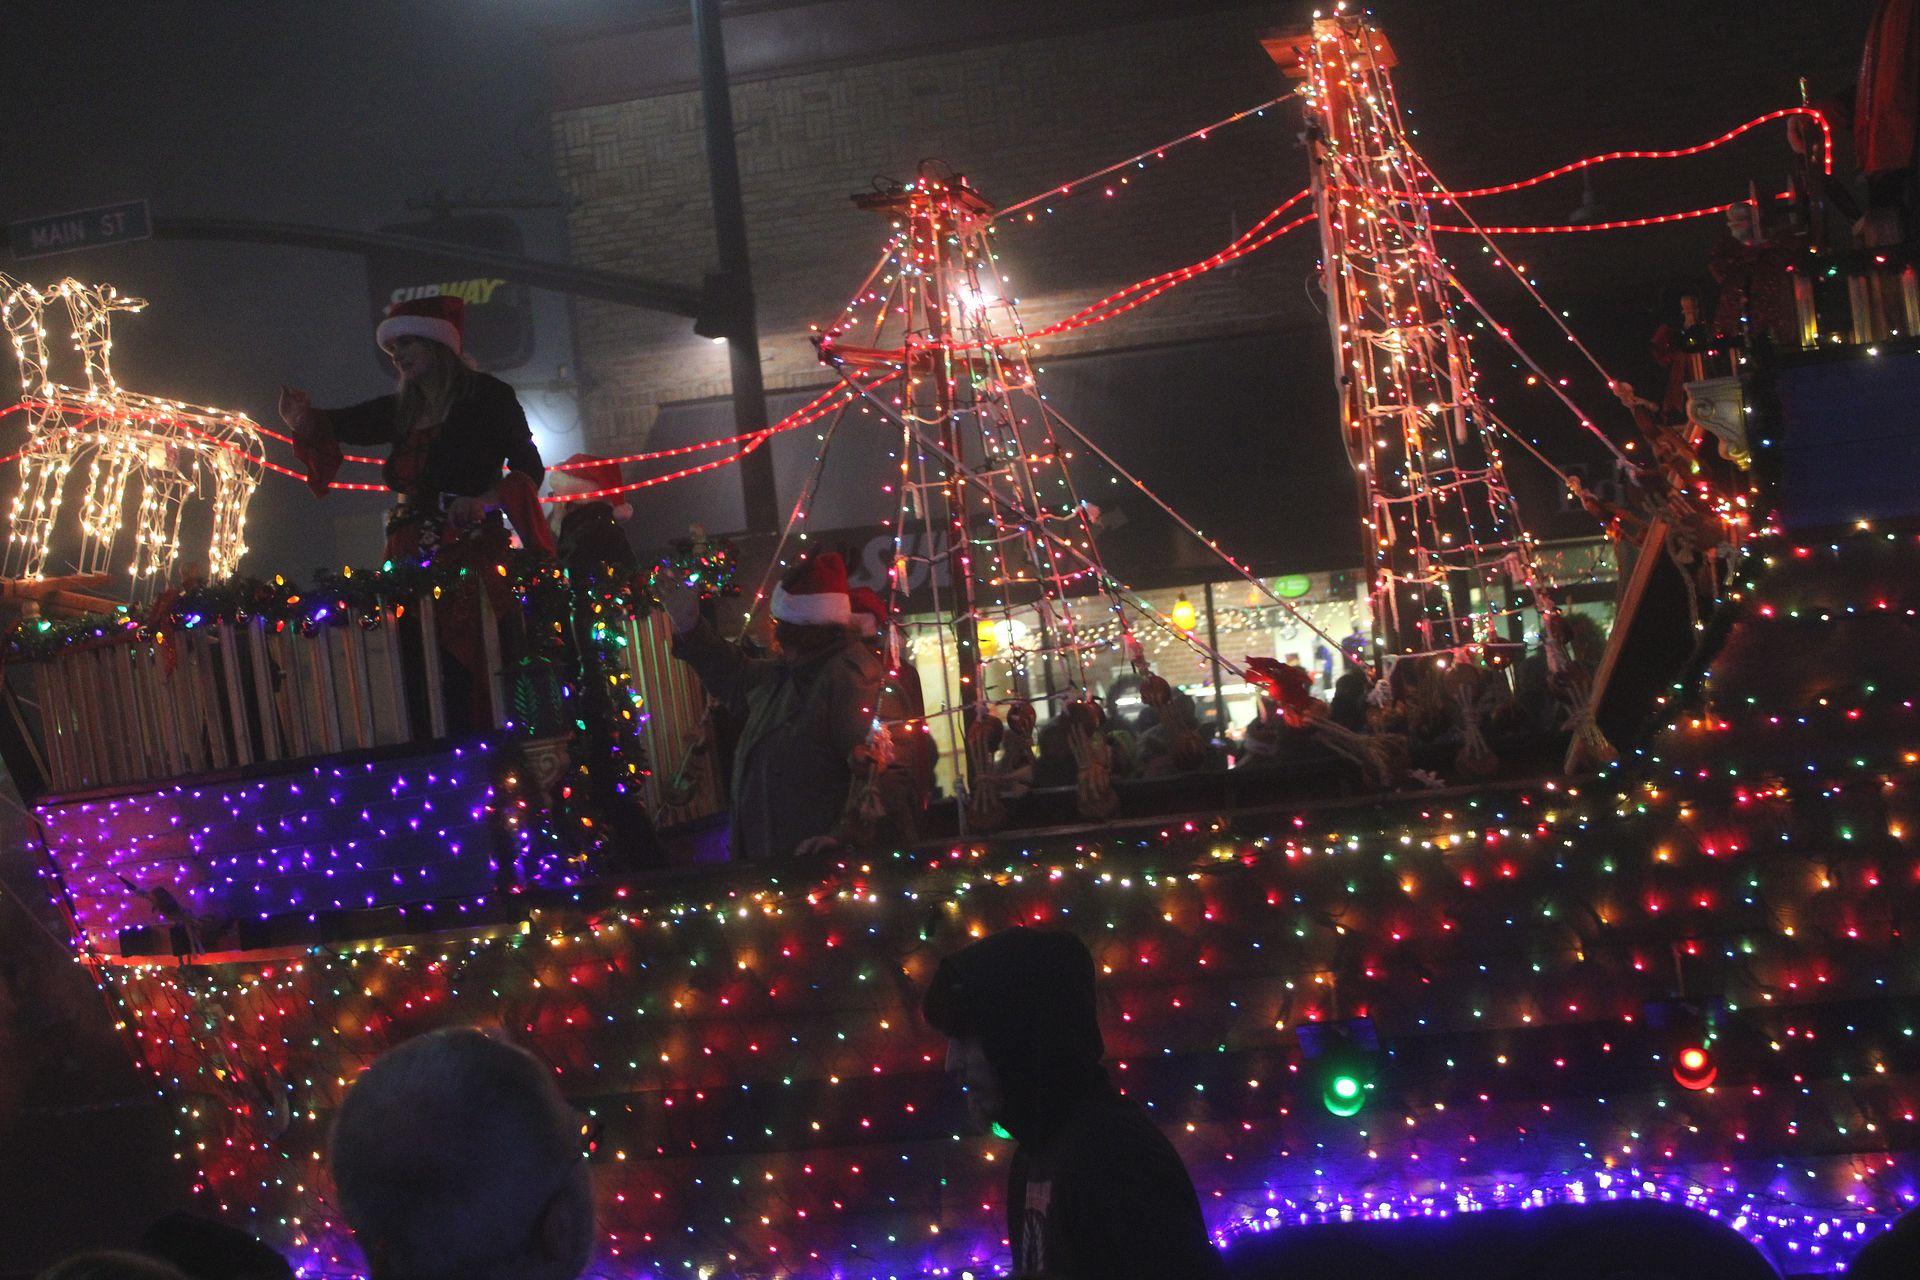 056 Montesano Festival of Lights December 14, 2019